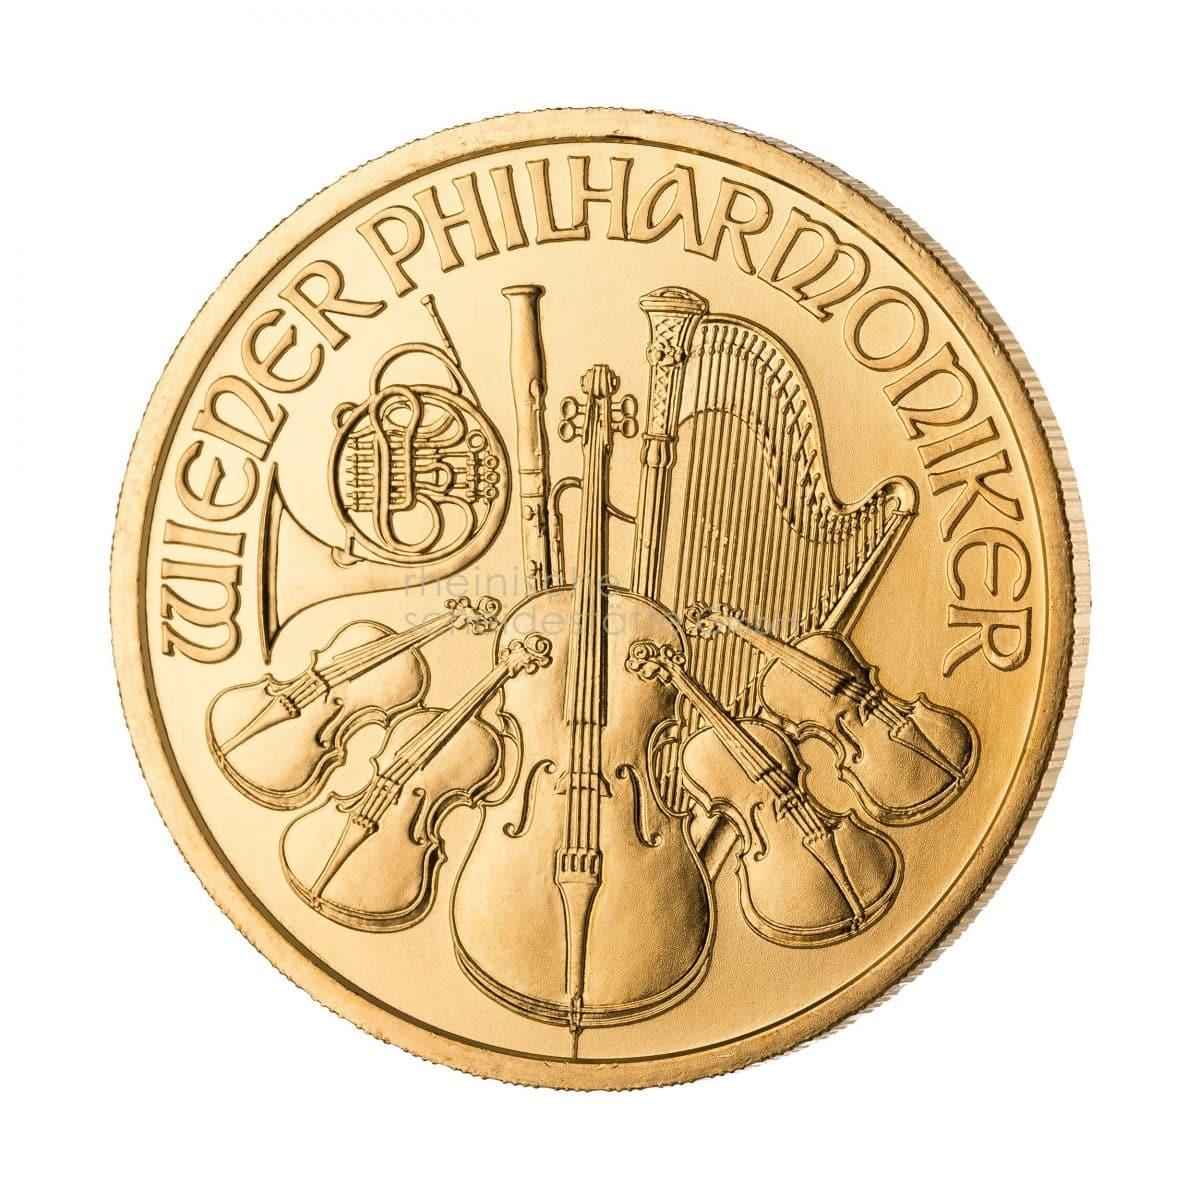 Wiener Philharmoniker Gold Goldmünzen Vorderseite